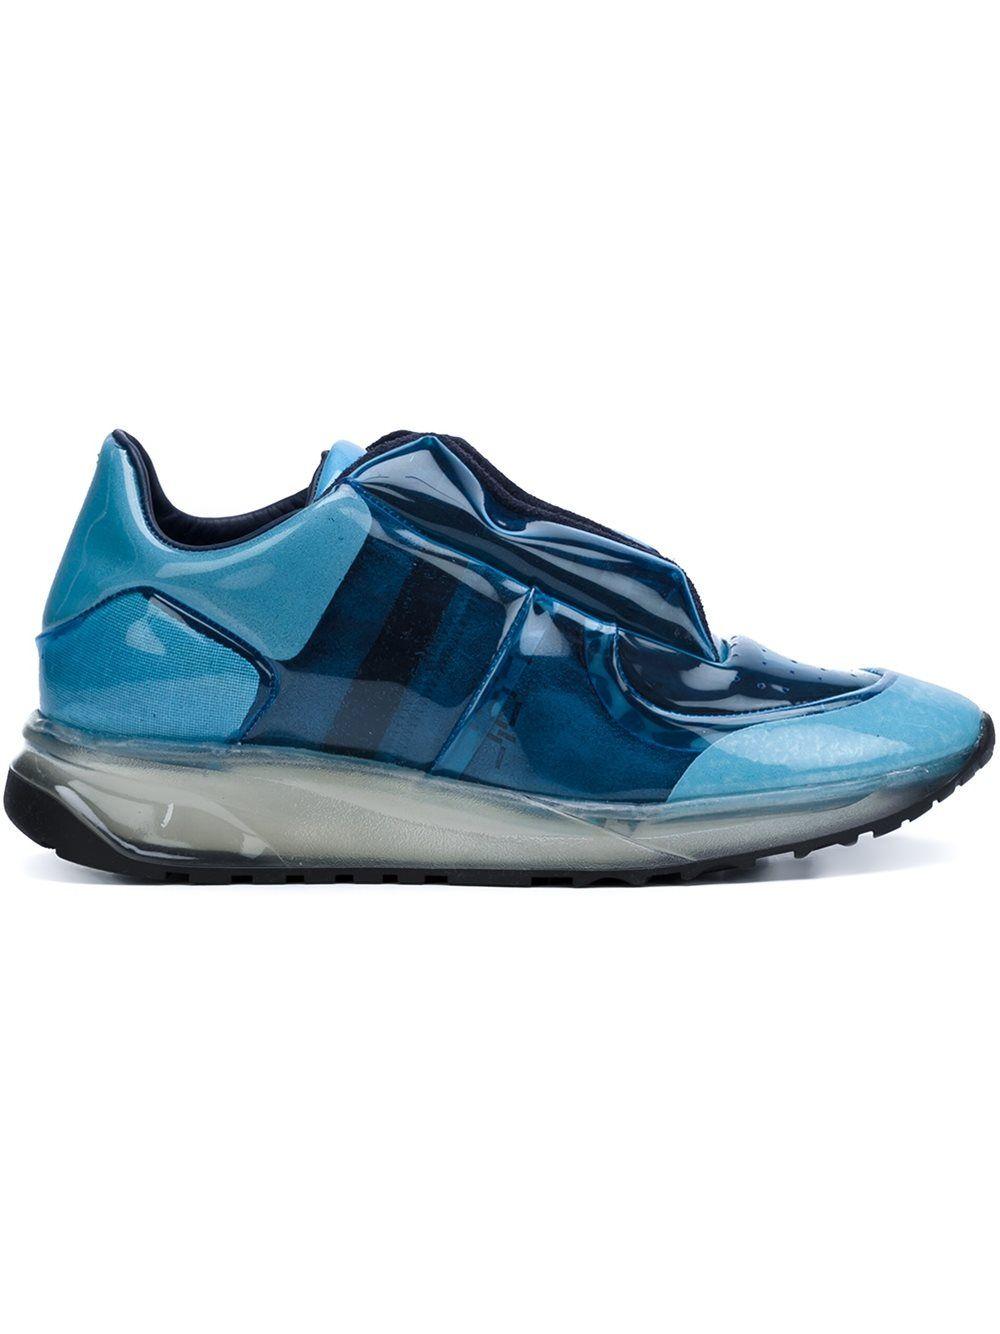 Maison Margiela 'Future' sneakers